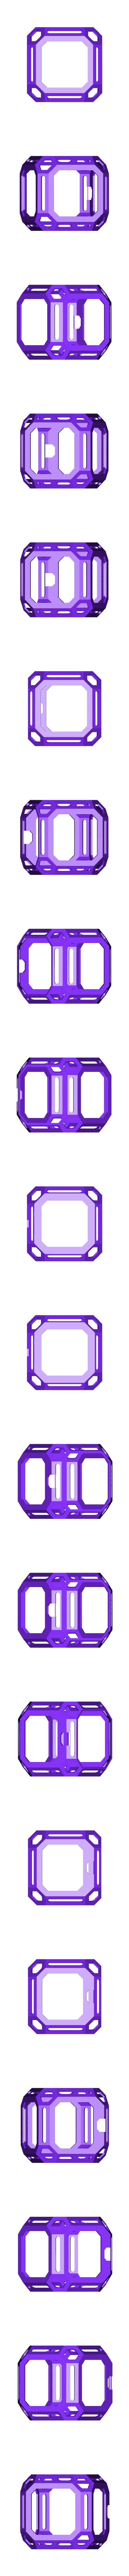 ttc-box-A.stl Download free STL file Time Tracking Cube • 3D print design, Adafruit